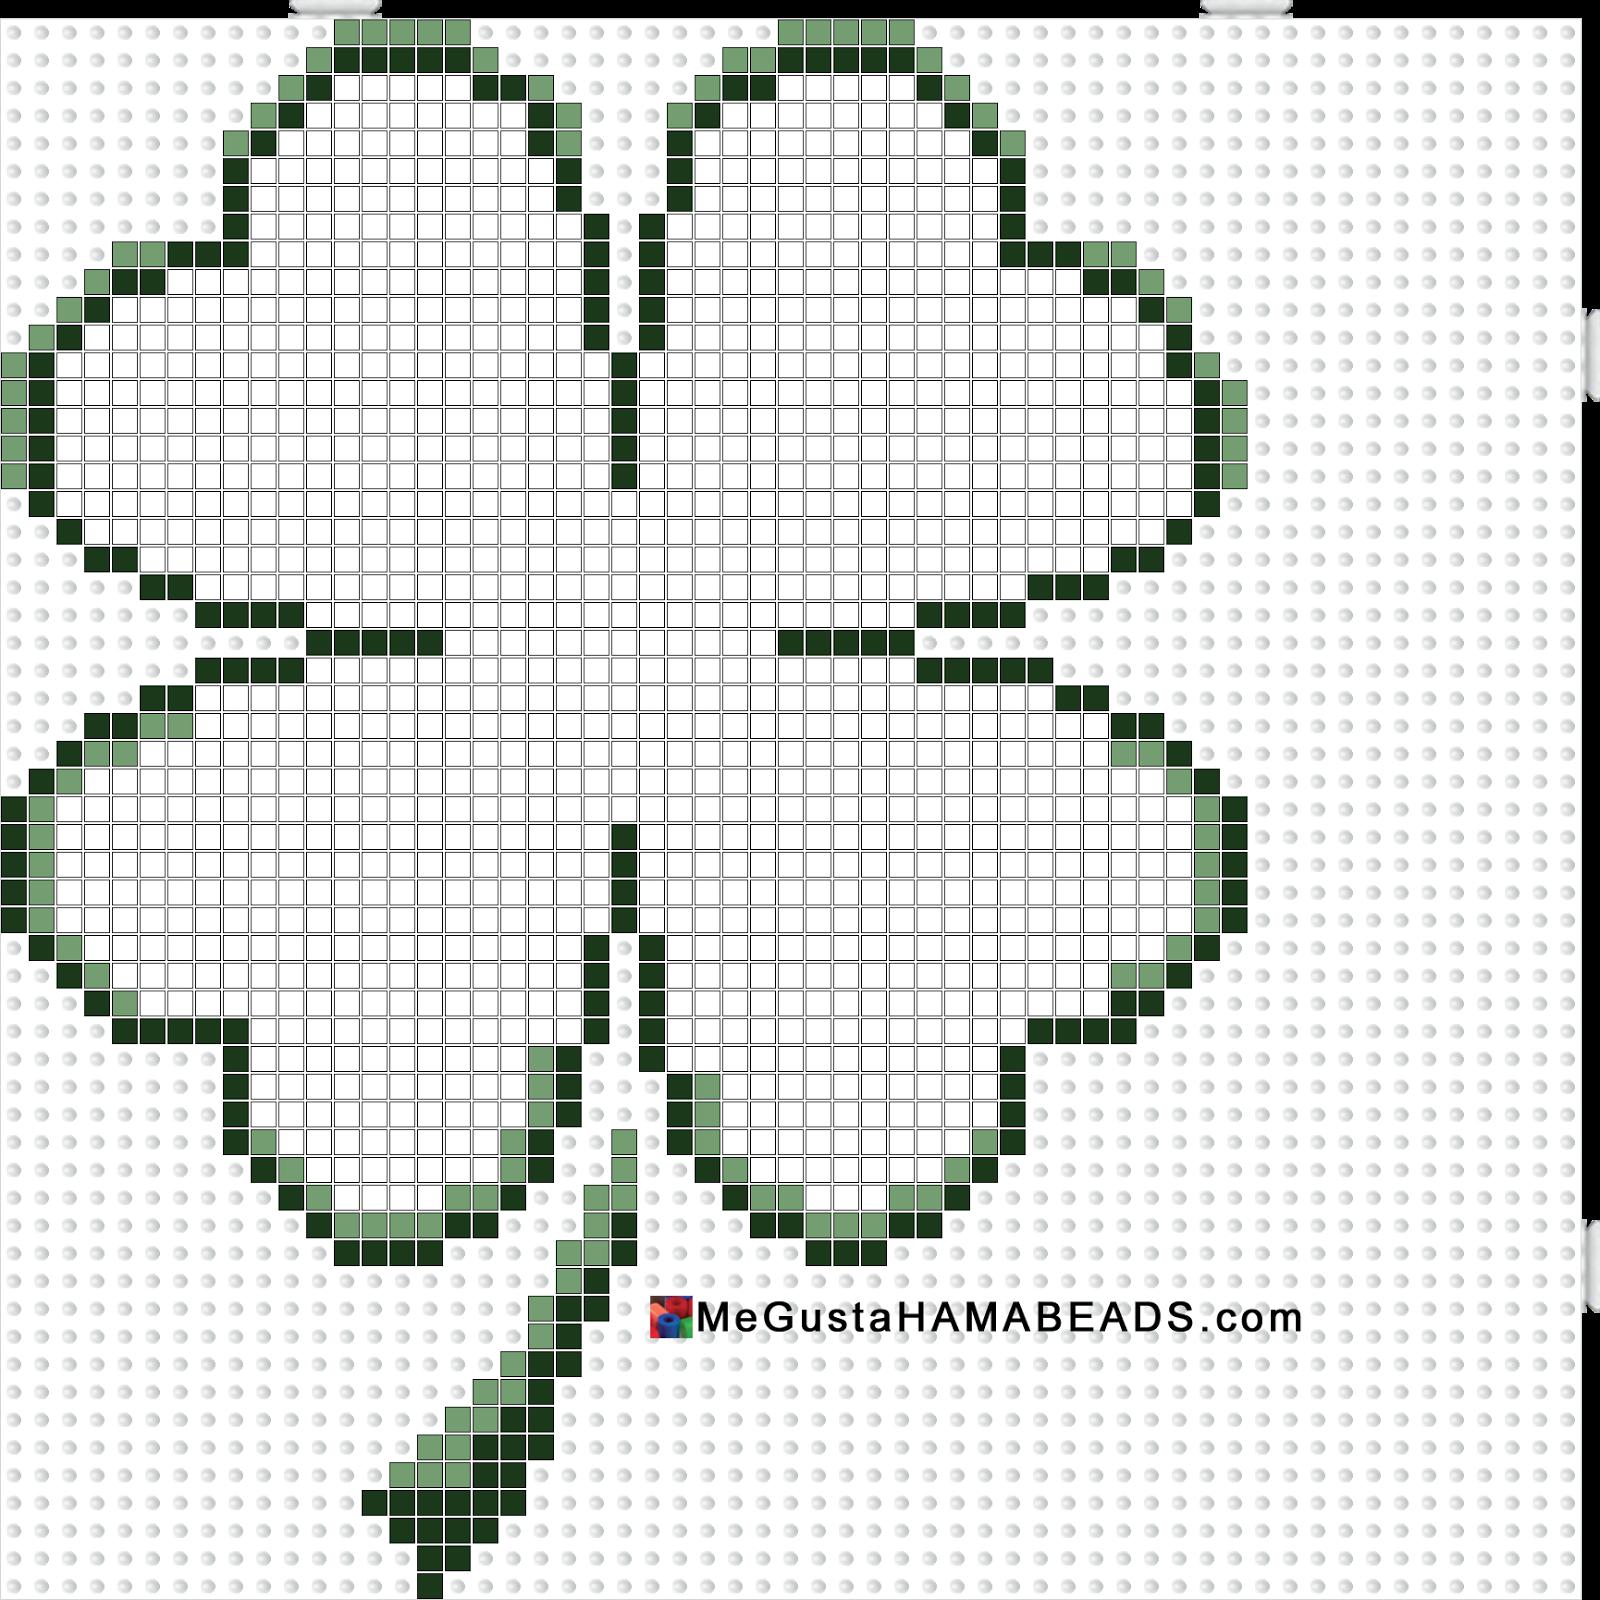 MeGustaHAMABEADS.com: Hama Beads Plantillas Estelada, Garfield, Jeep ...